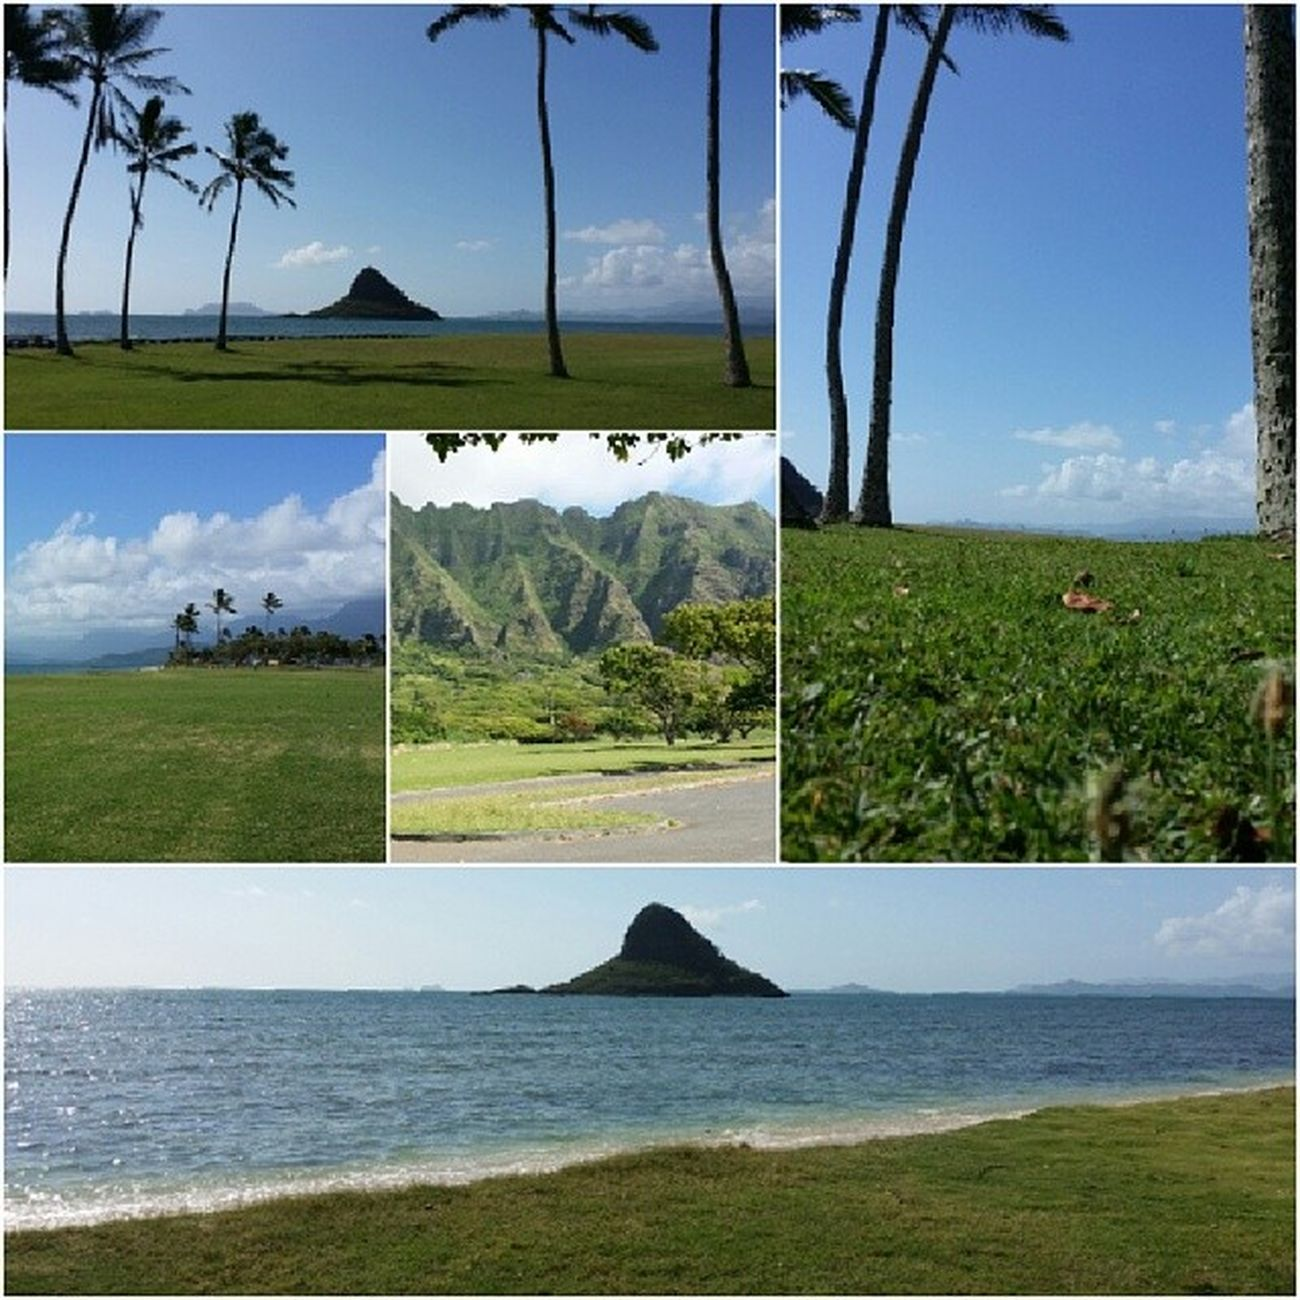 Kualoa Regional Park Hawaii Oahu Venturehawaii statepark Nicebreeze Liberty Scenic USN Justkoolingit Humpday